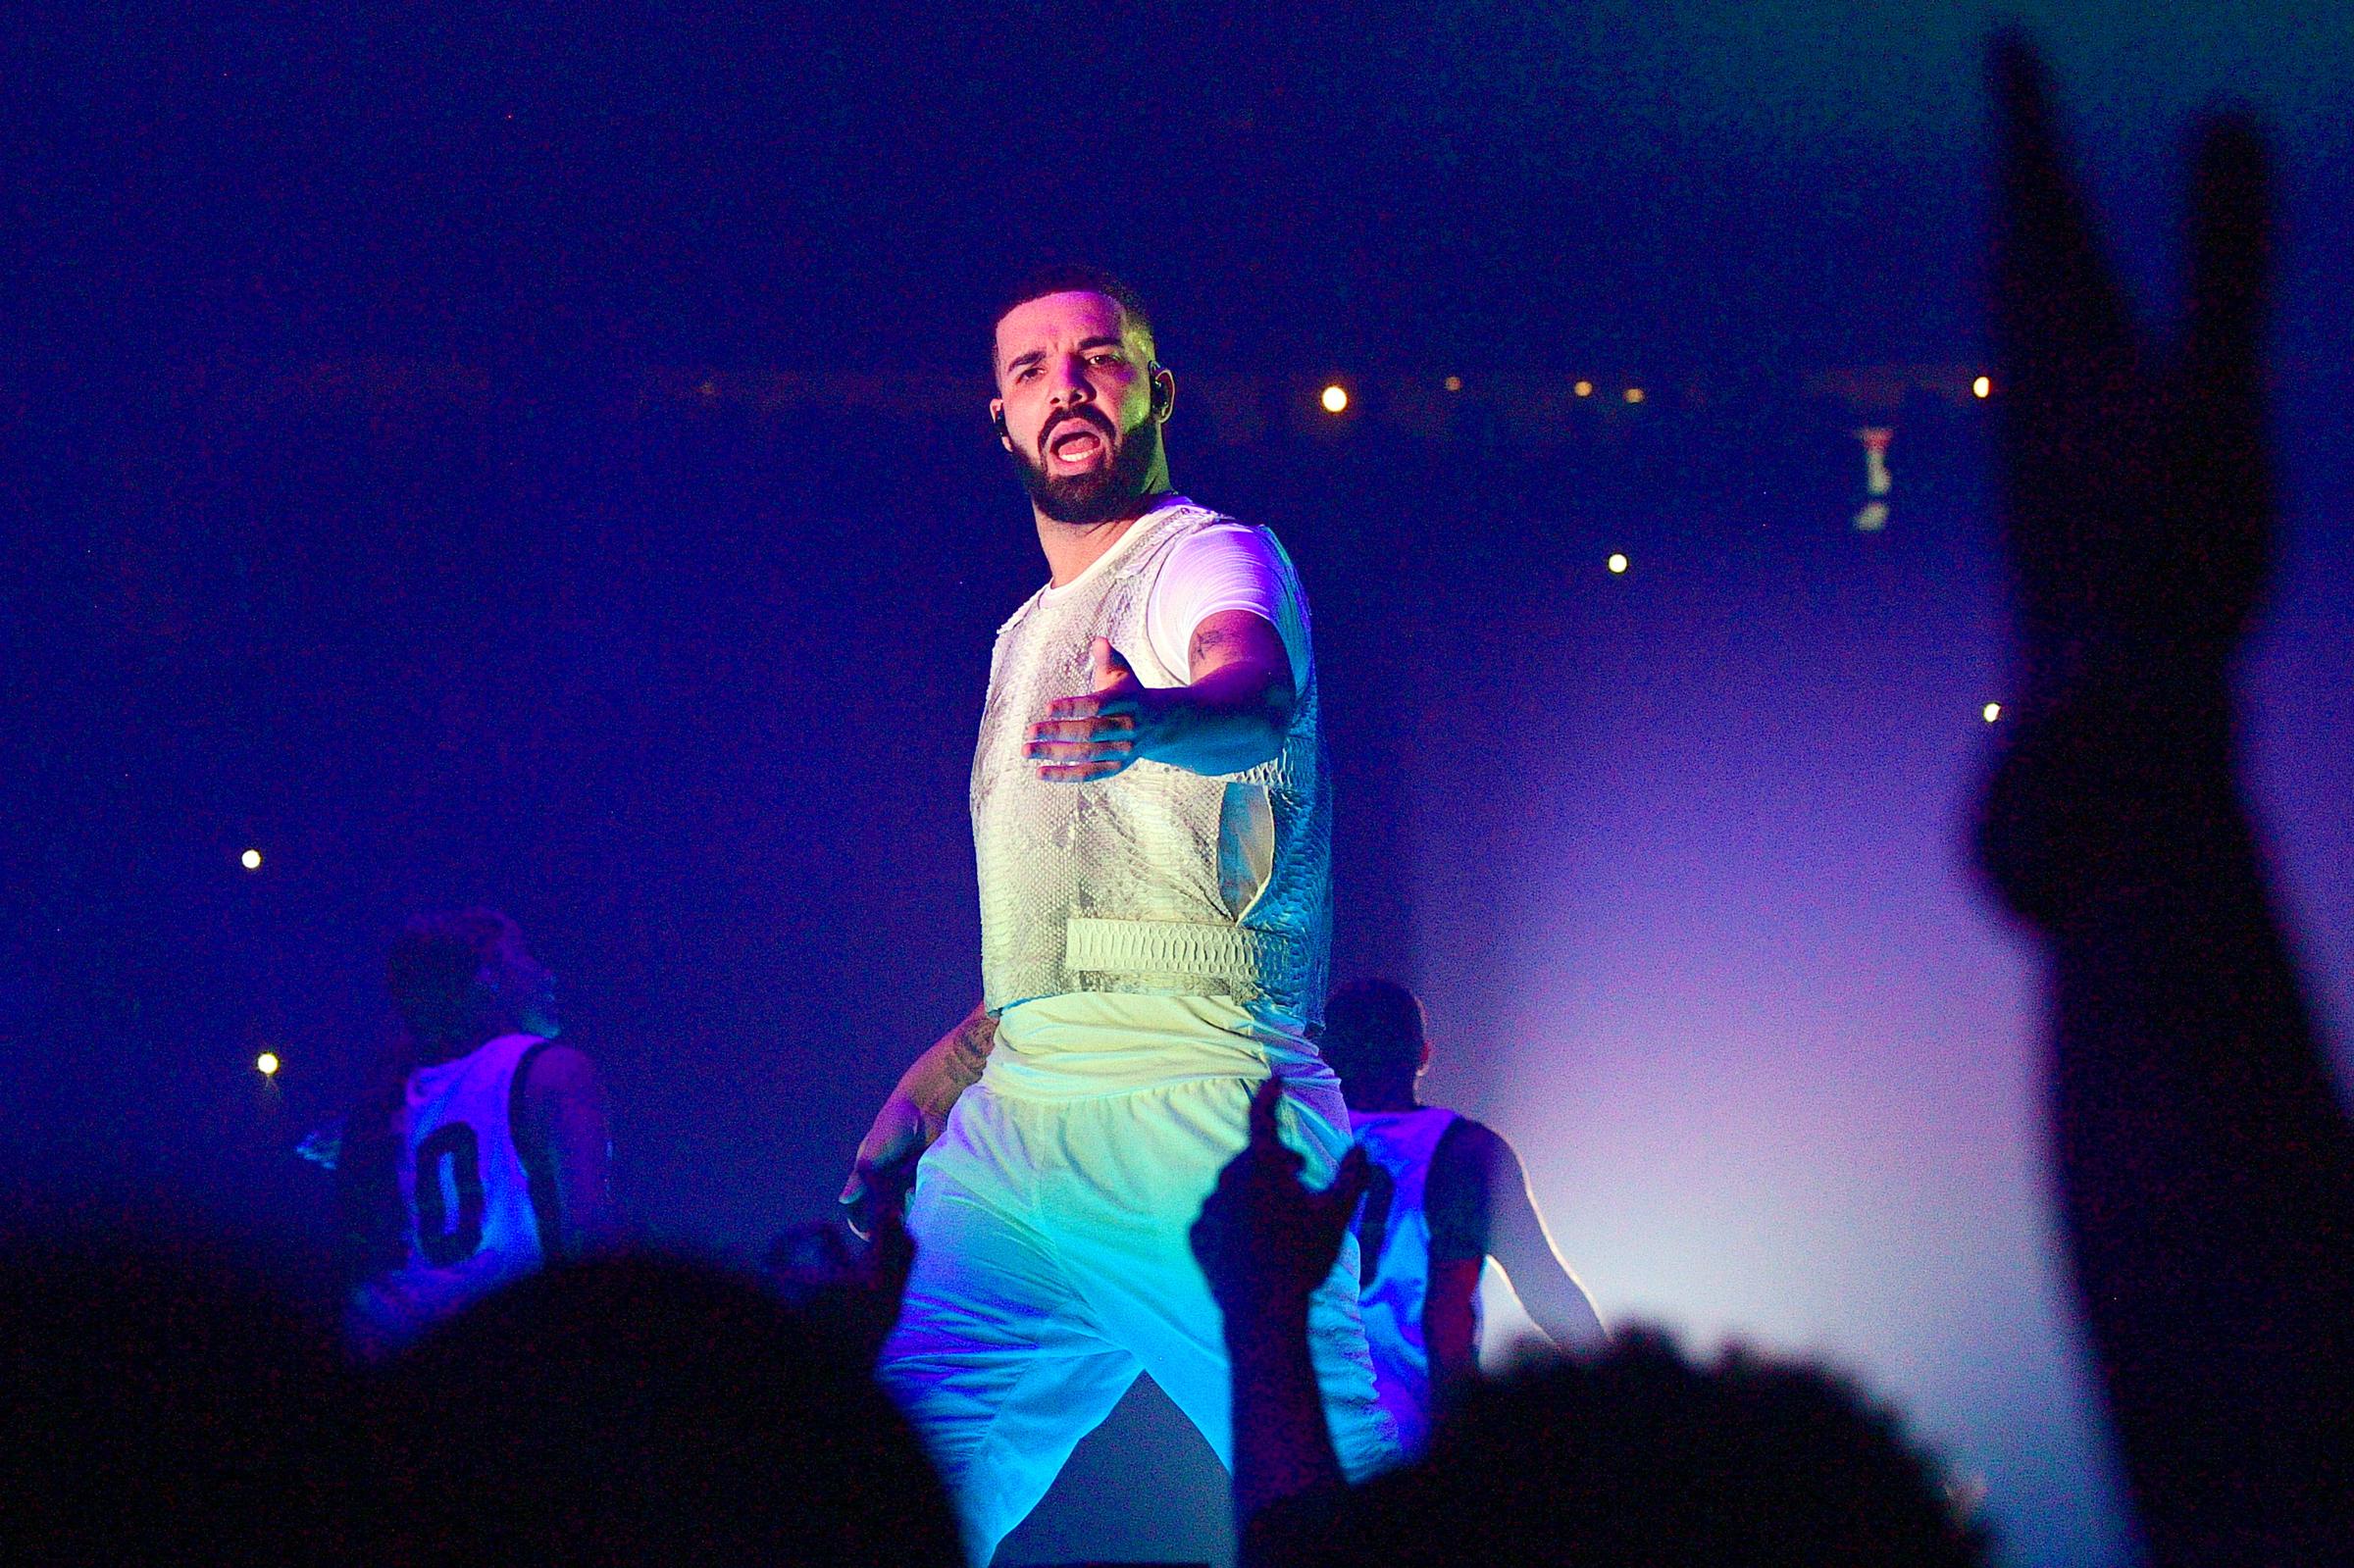 ATLANTA, GA - NOVEMBER 18: Drake performs onstage during the Final Stop of 'Aubrey & The three Amigos Tour' at State Farm Arena on November 18, 2018 in Atlanta, Georgia.(Photo by Prince Williams/Wireimage)